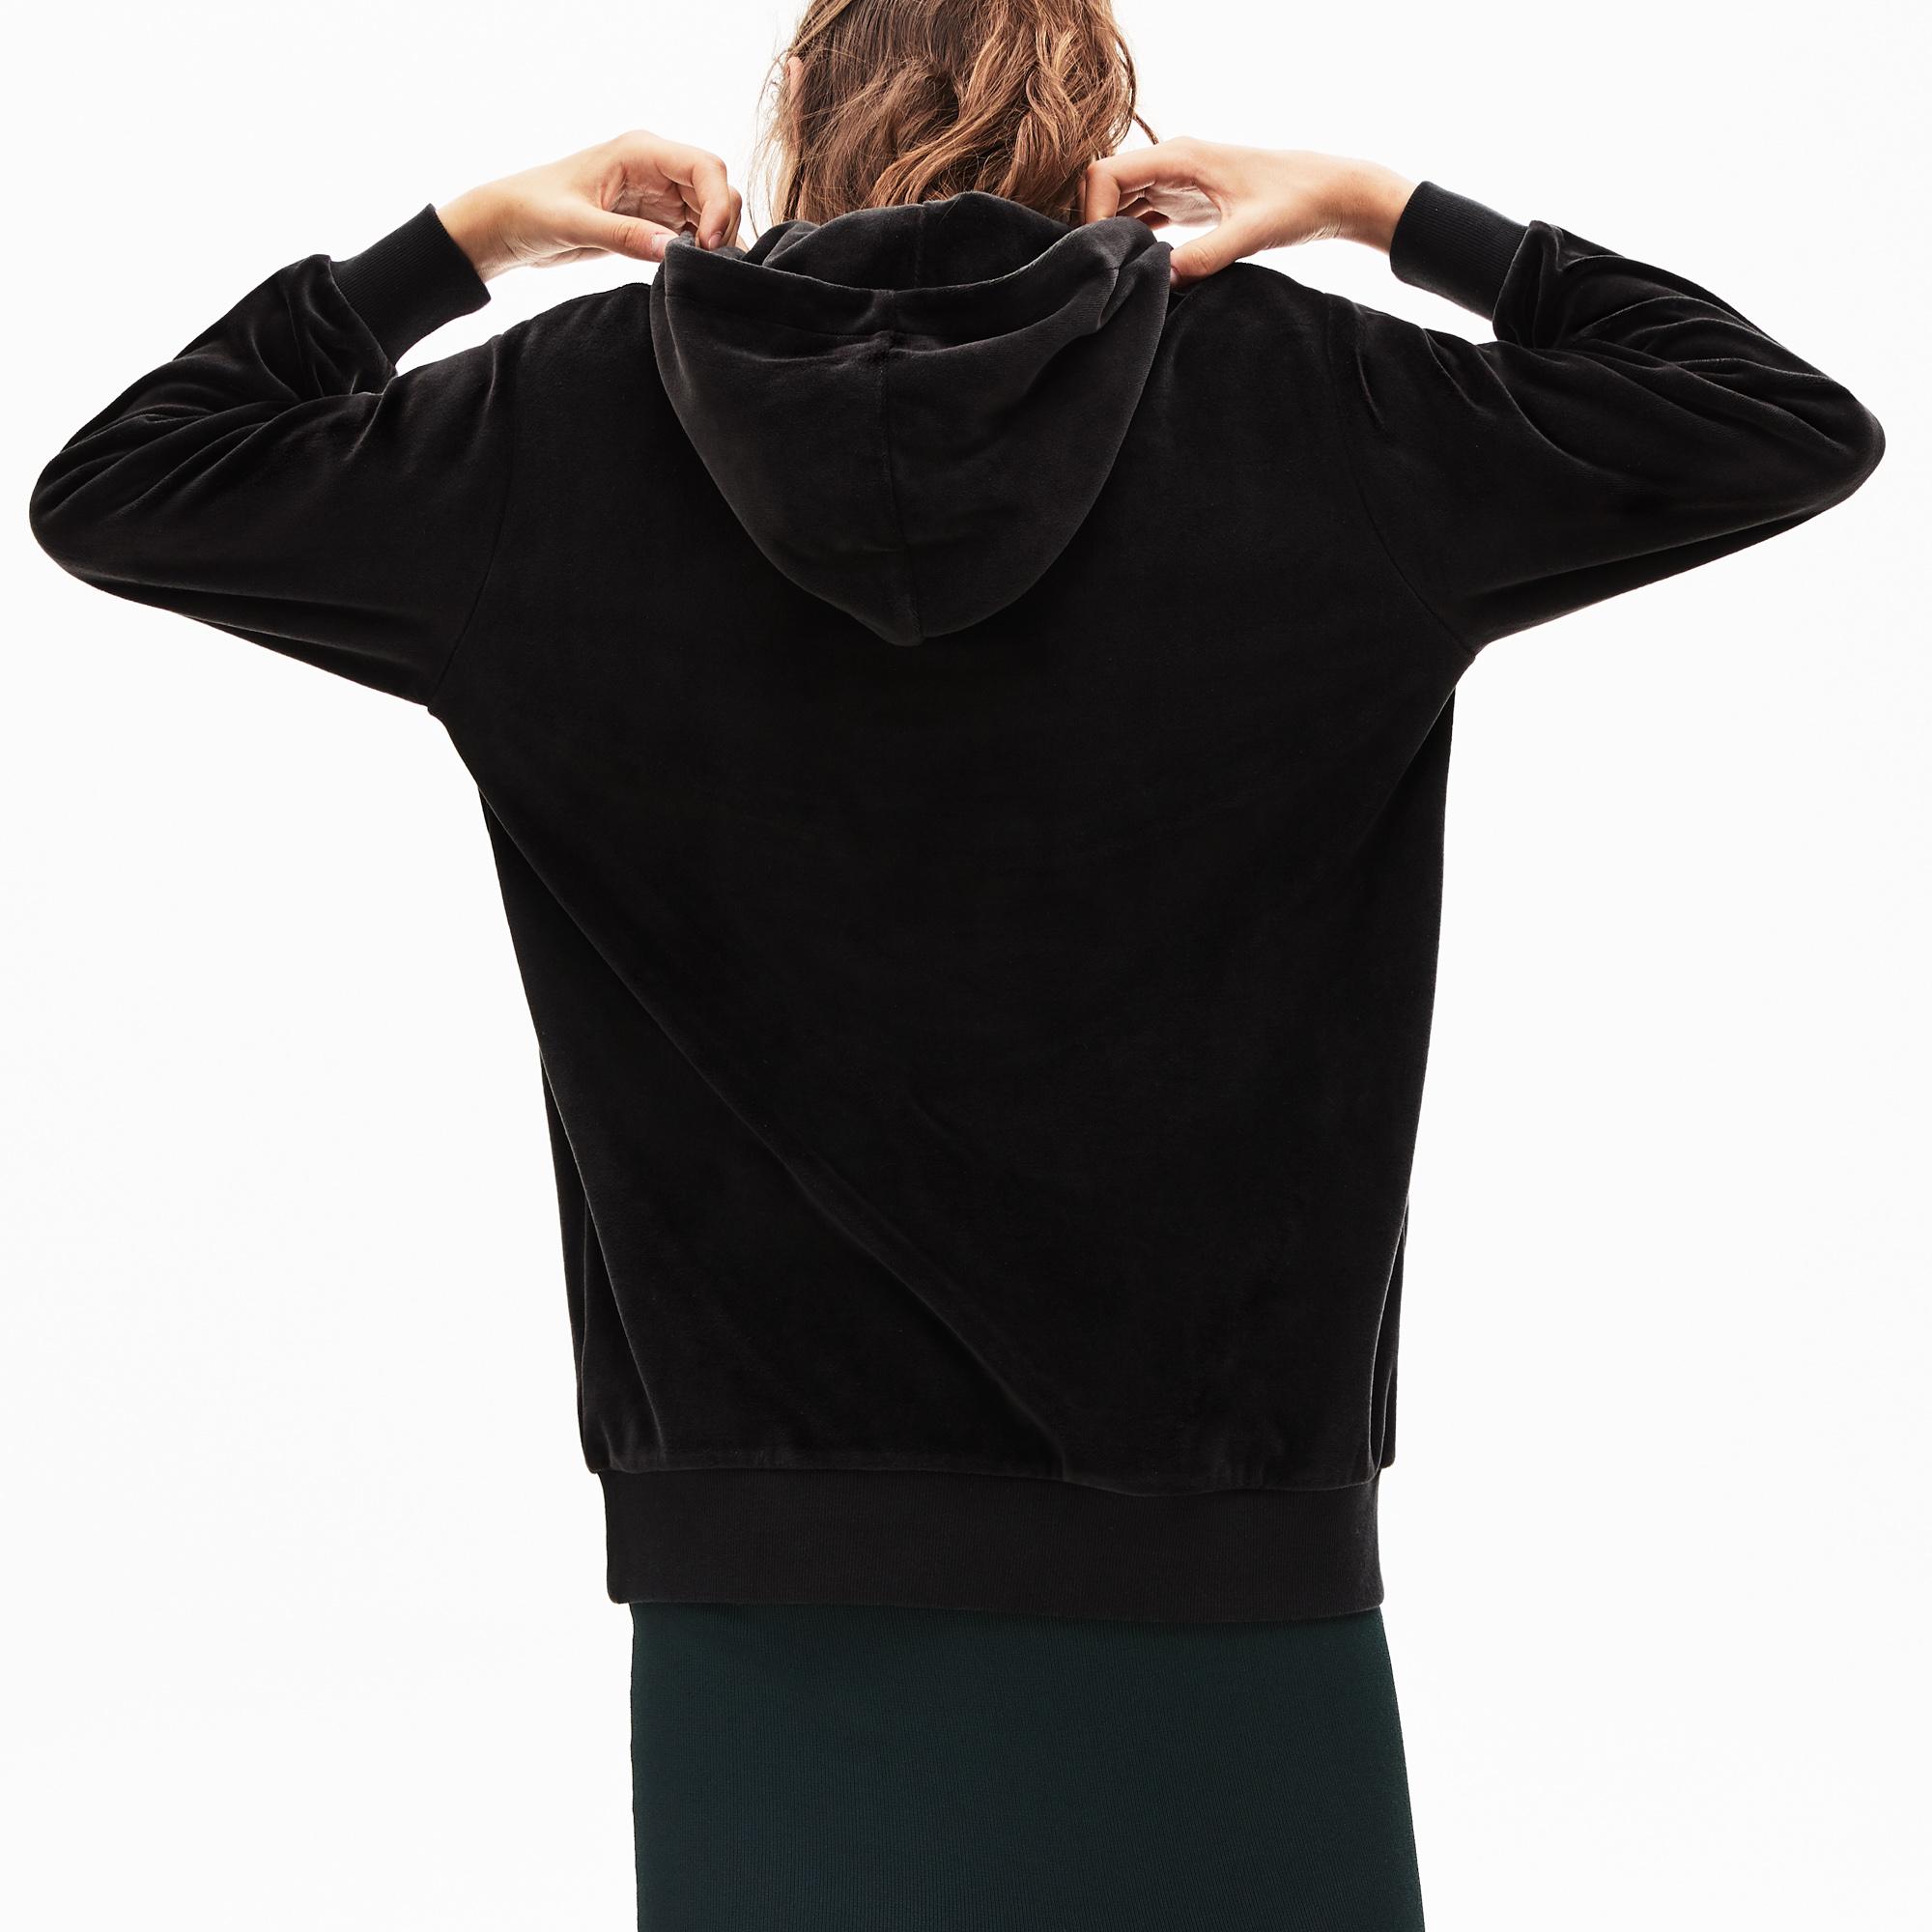 Lacoste L!VE Women's Golden Signature Hooded Velvet Sweatshirt